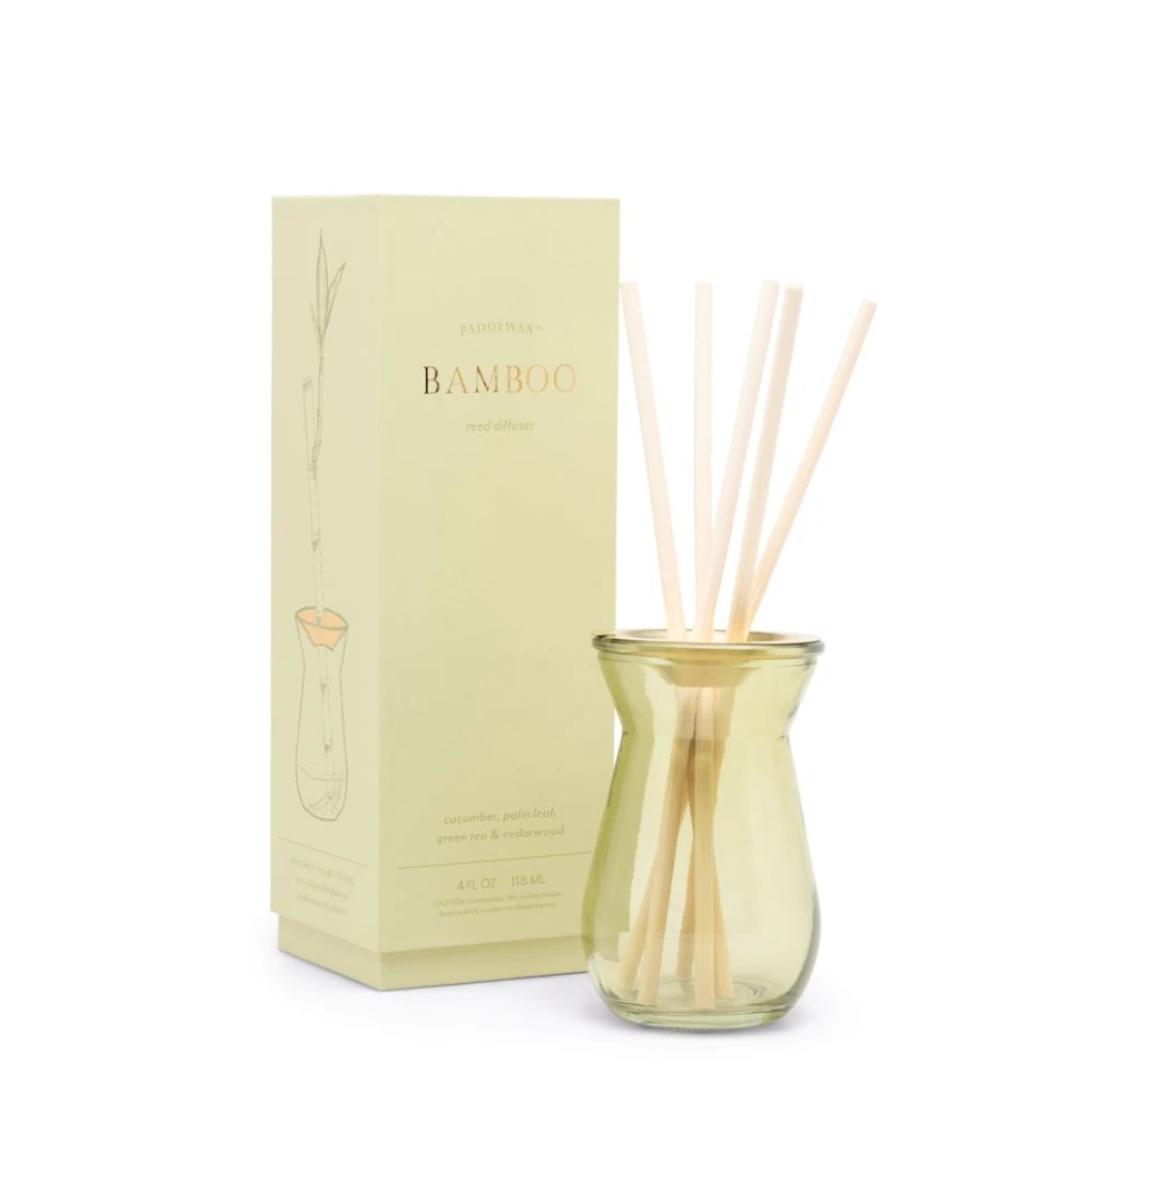 PADDYWAX Flora Diffuser-Bamboo